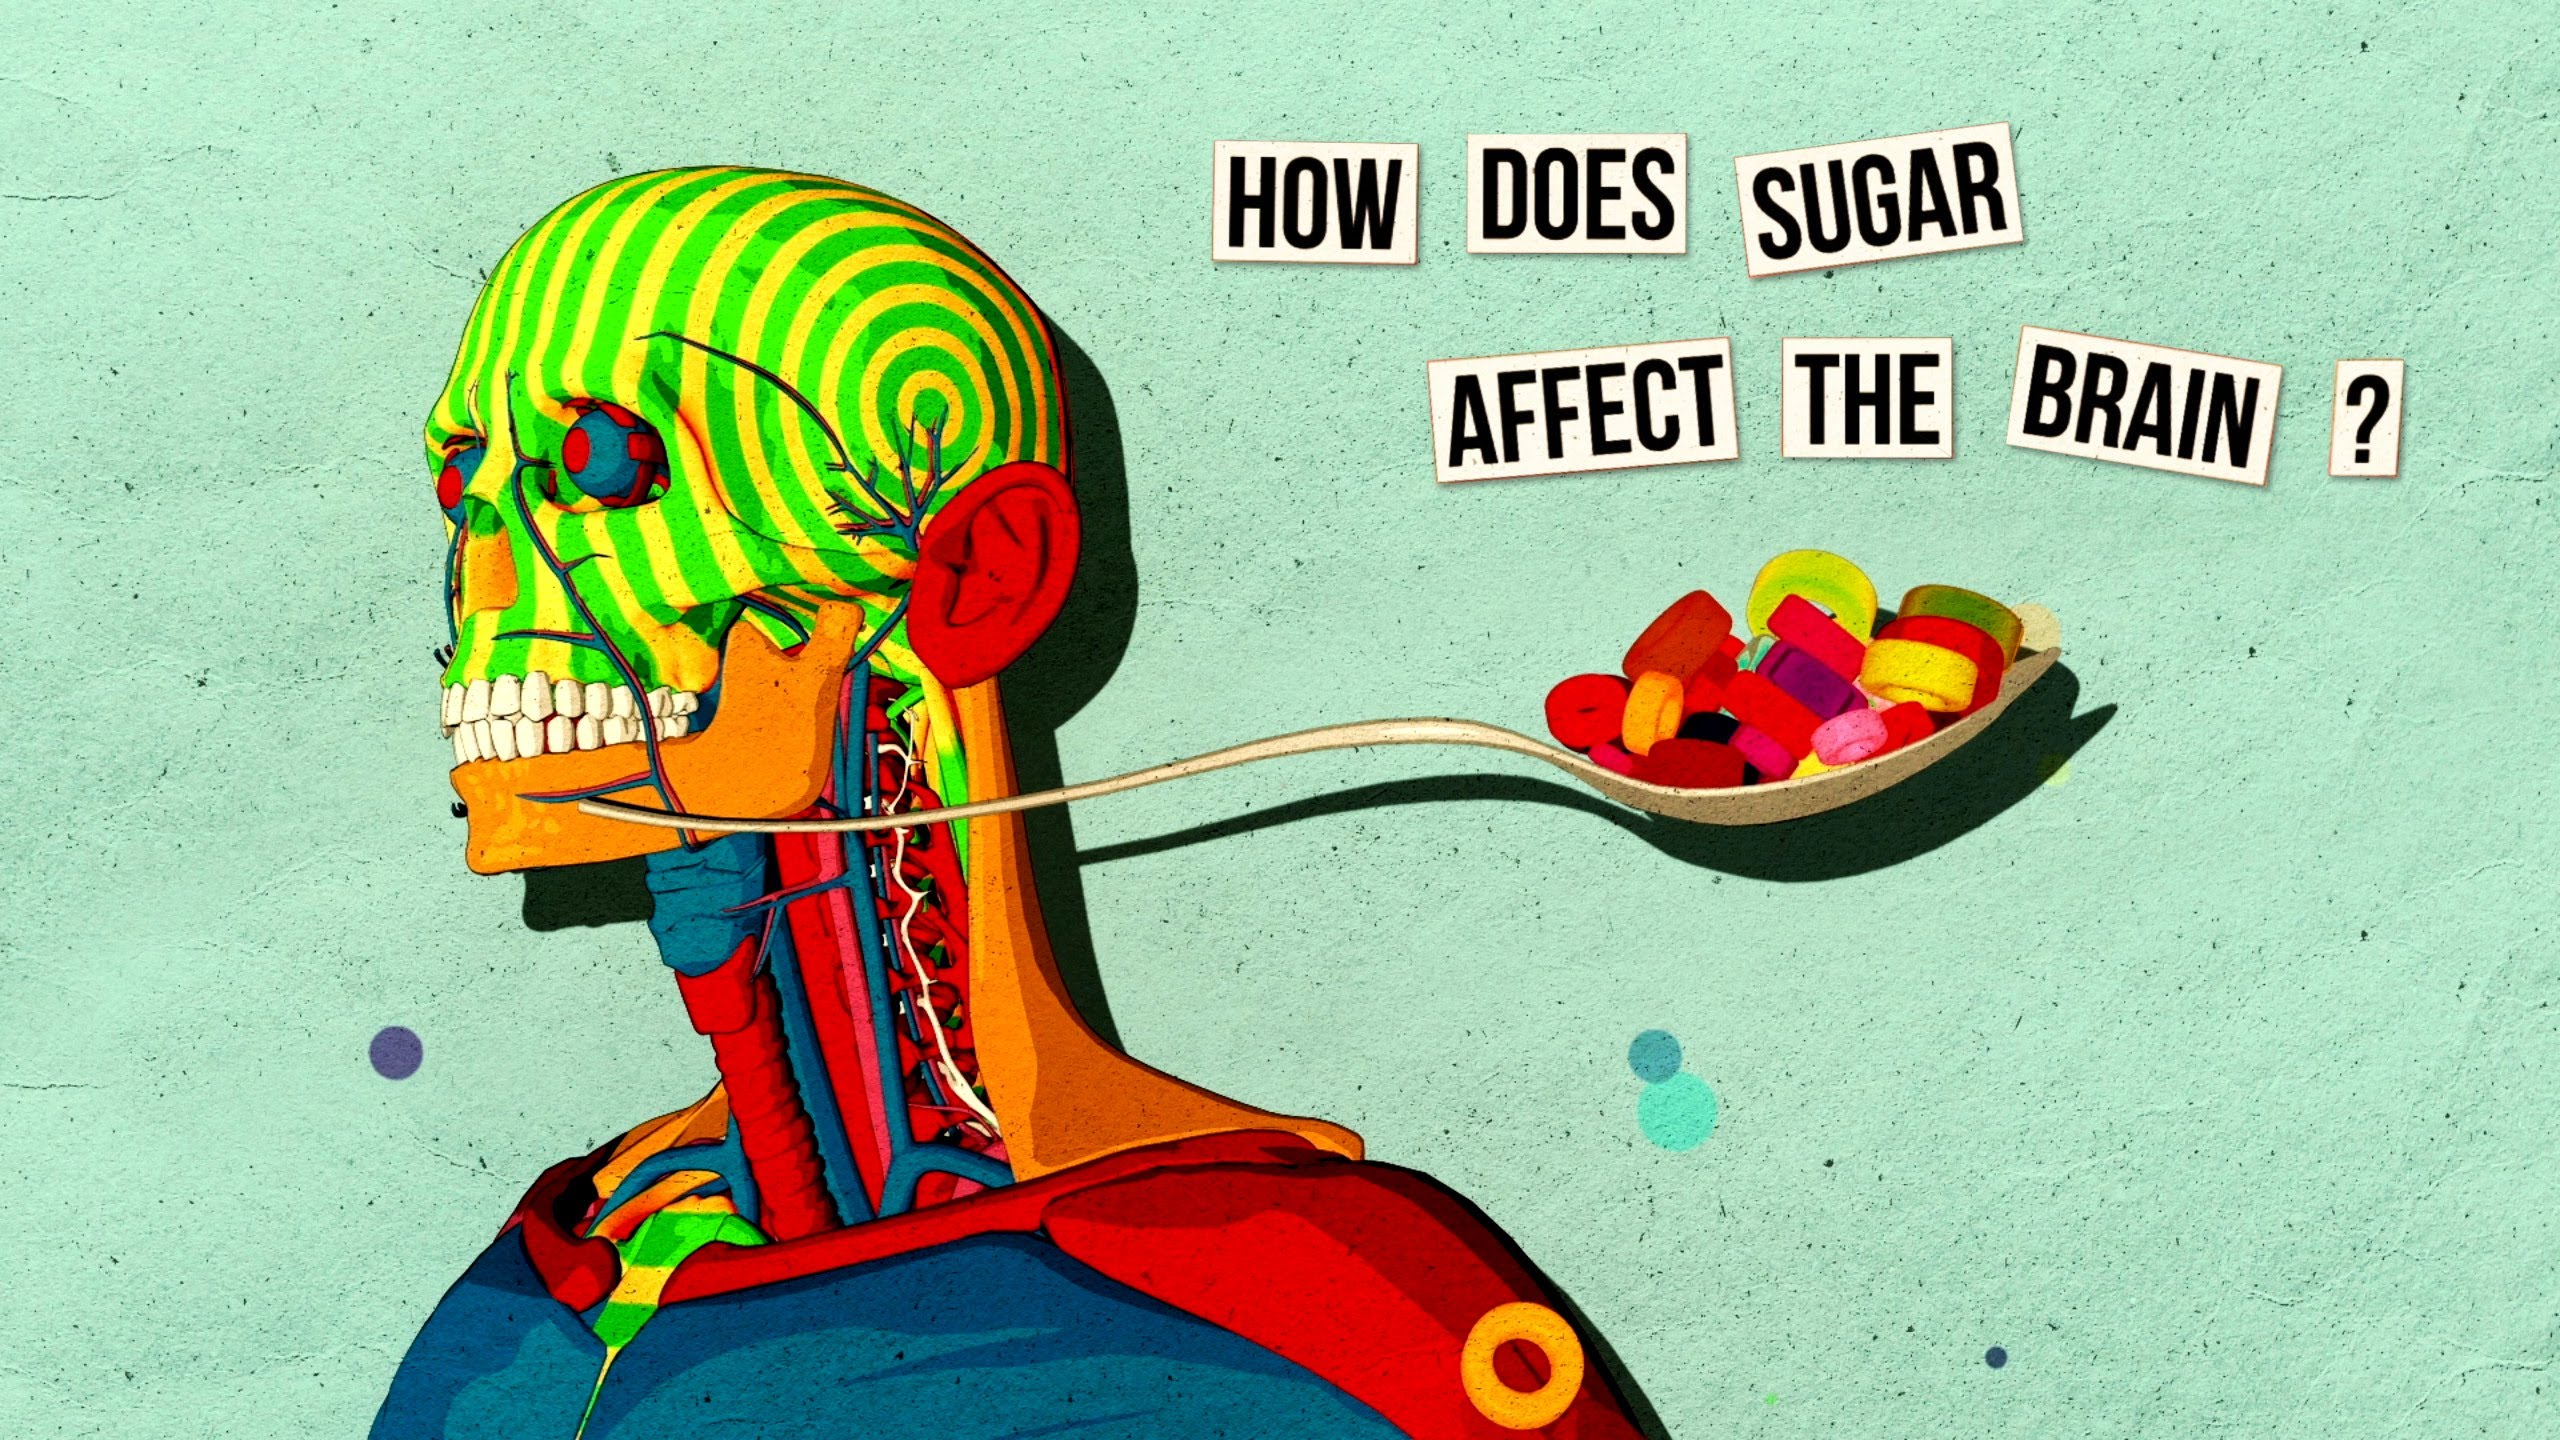 「吃甜食好開心──糖如何影響頭腦?」- How Sugar Affects the Brain